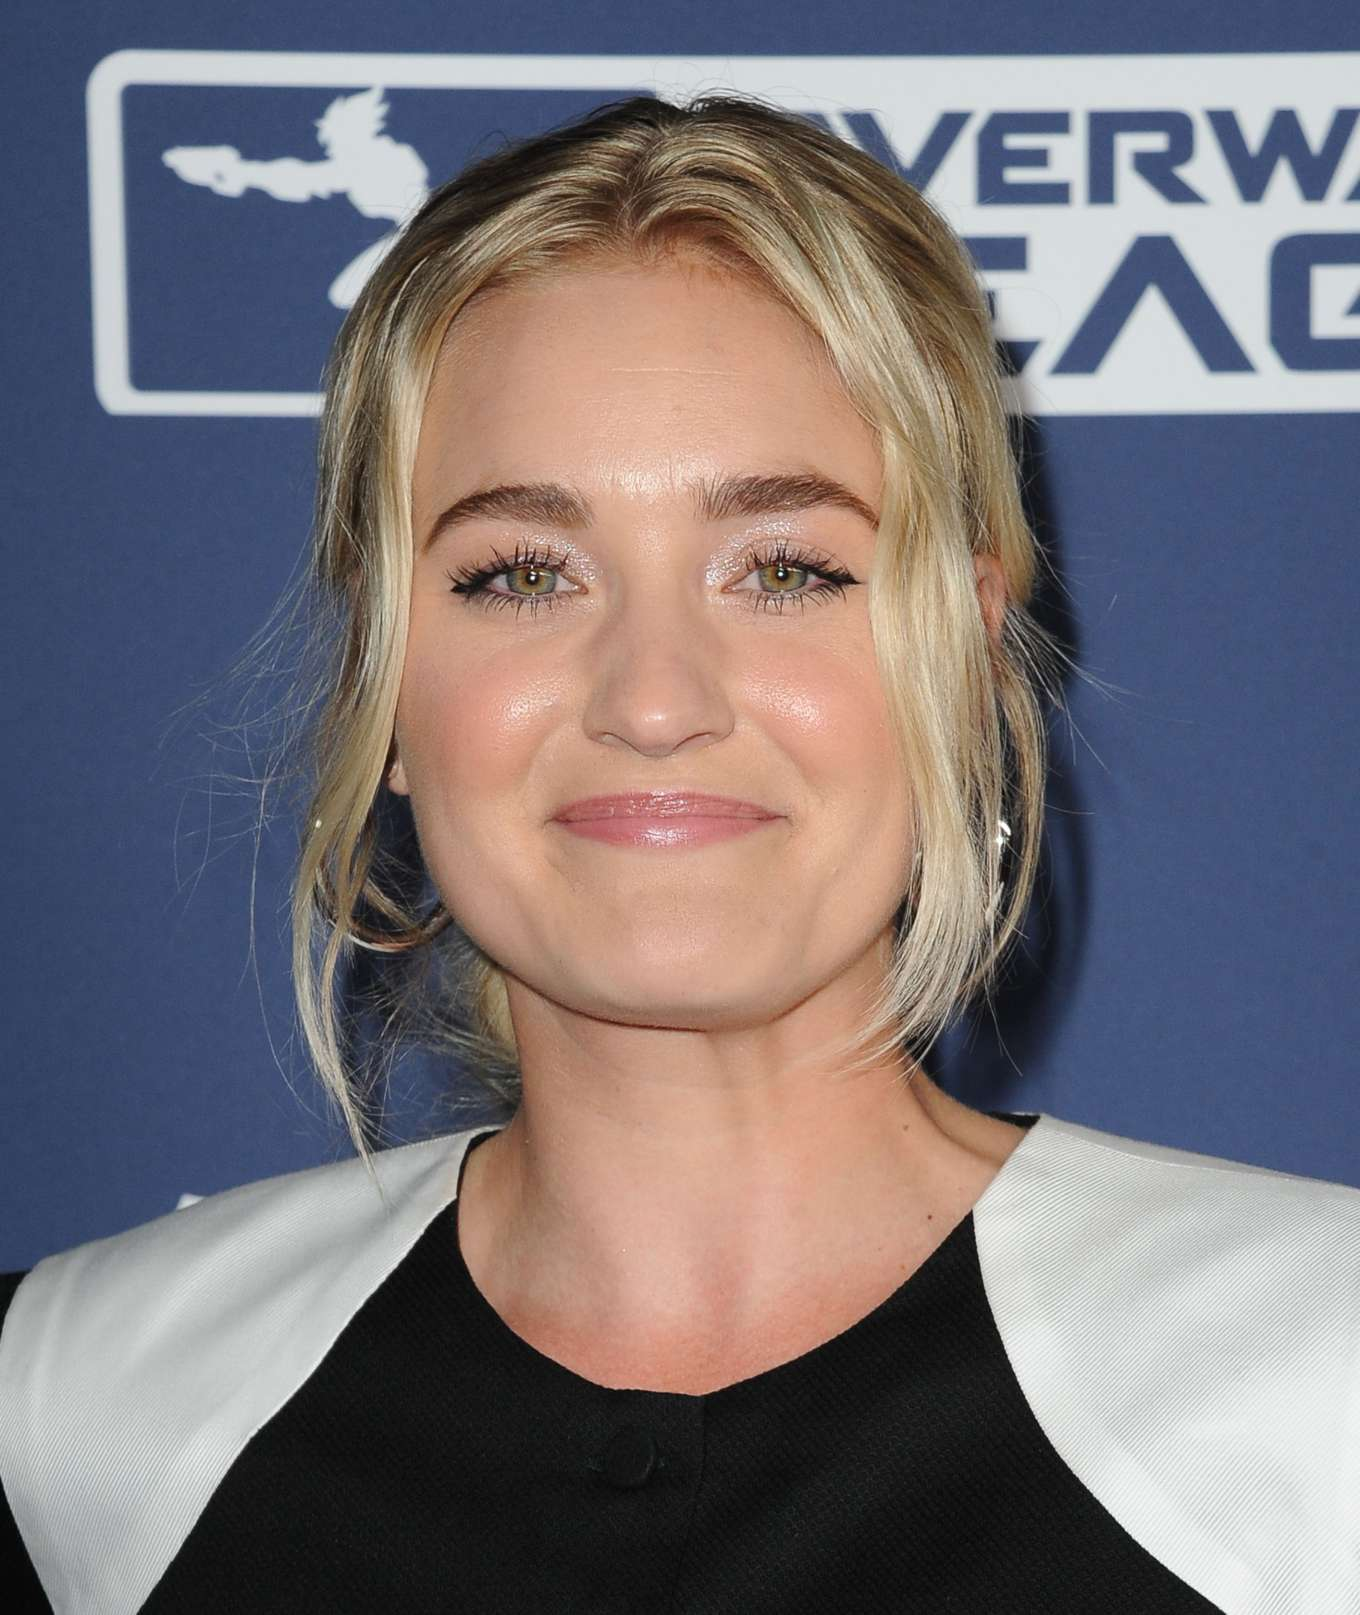 AJ Michalka 2019 : AJ Michalka – Varietys Power of Young Hollywood 2019-14